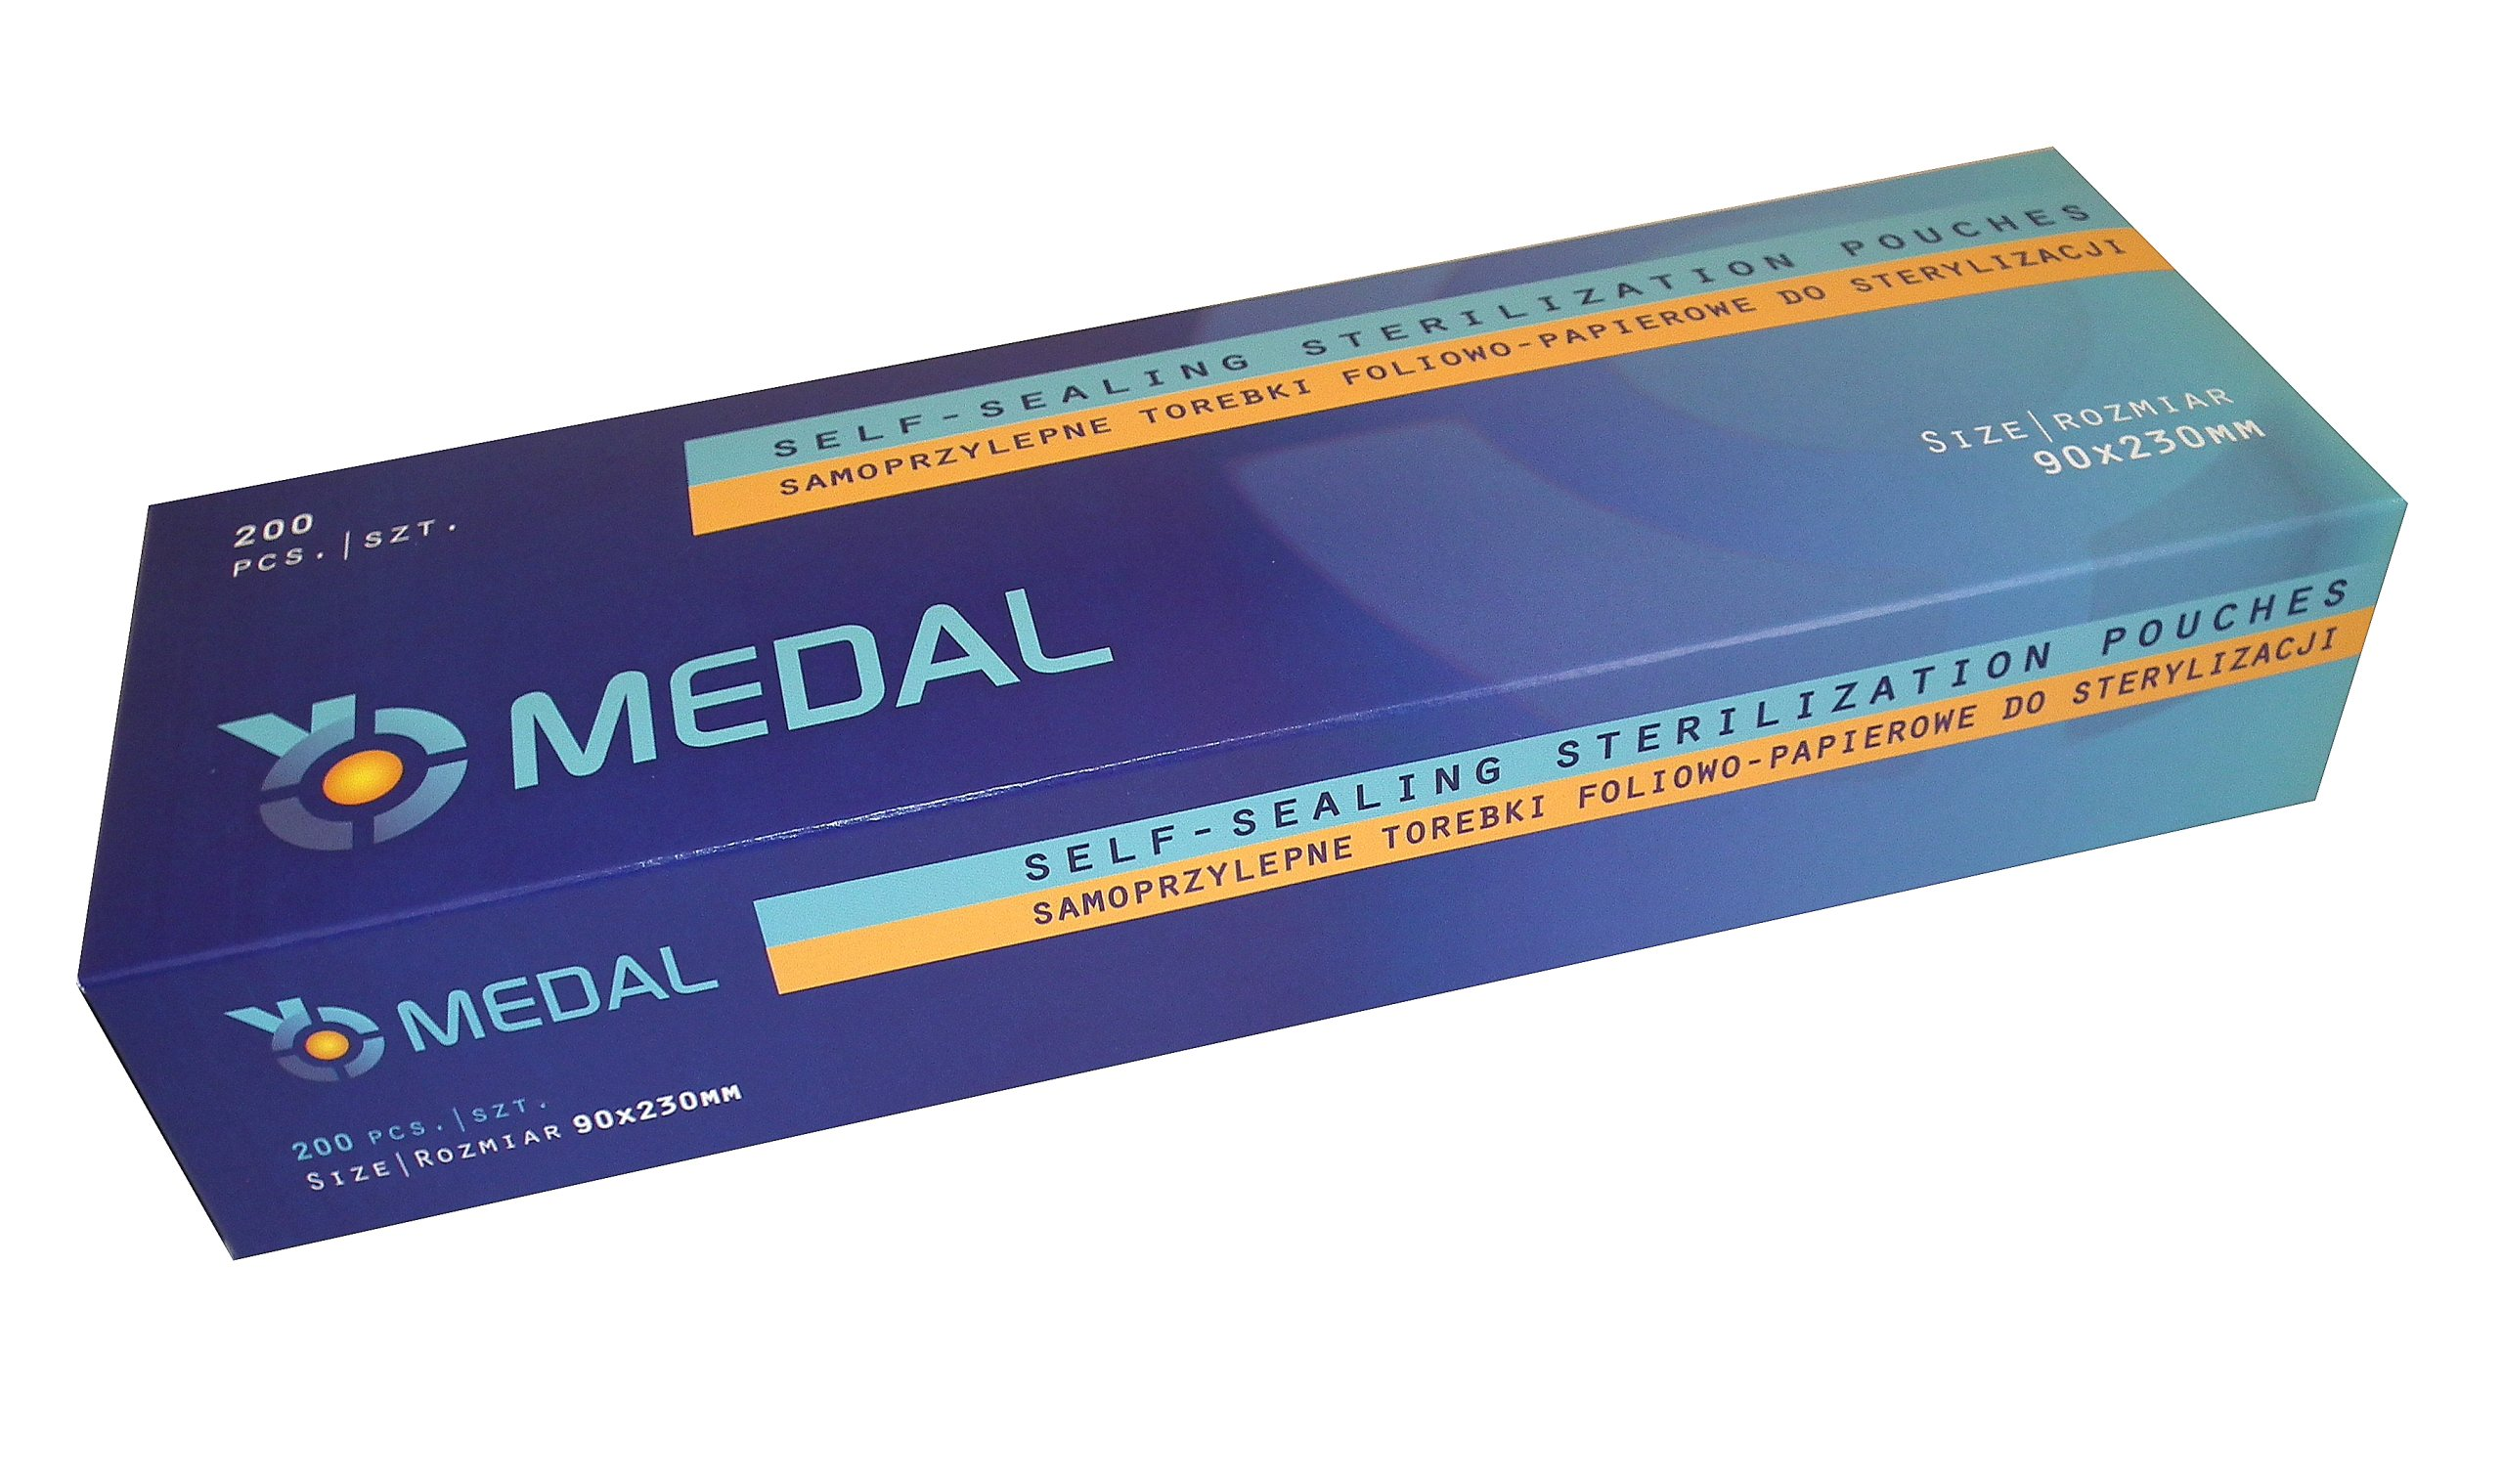 Item PACKAGES FOR STERILIZATION 90mmx 230mm MEDAL 200 PCs